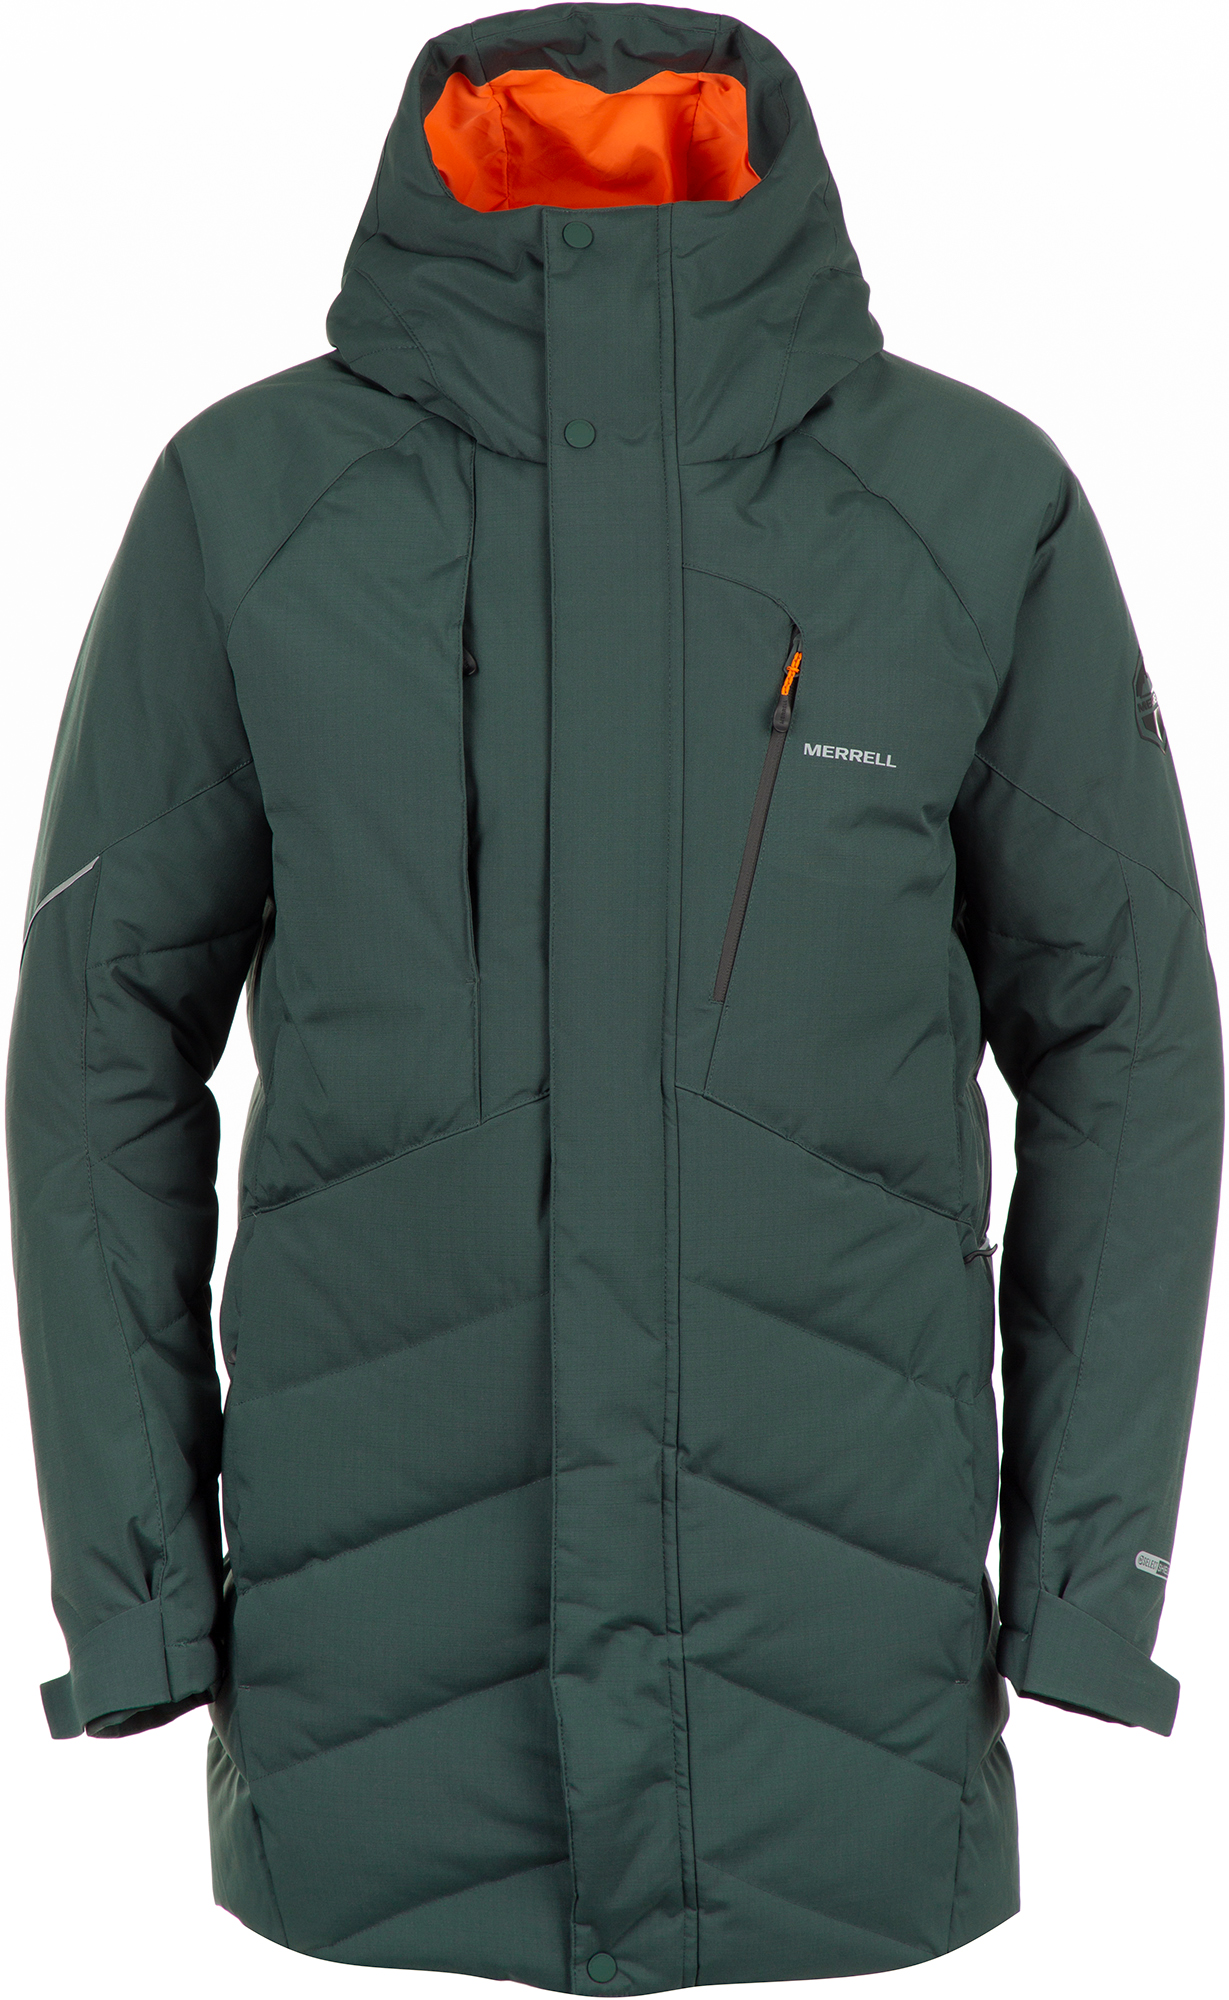 Merrell Куртка пуховая мужская Merrell, размер 52 пуховик женский merrell women s jacket цвет петроль a19amrjaw02 s3 размер 46